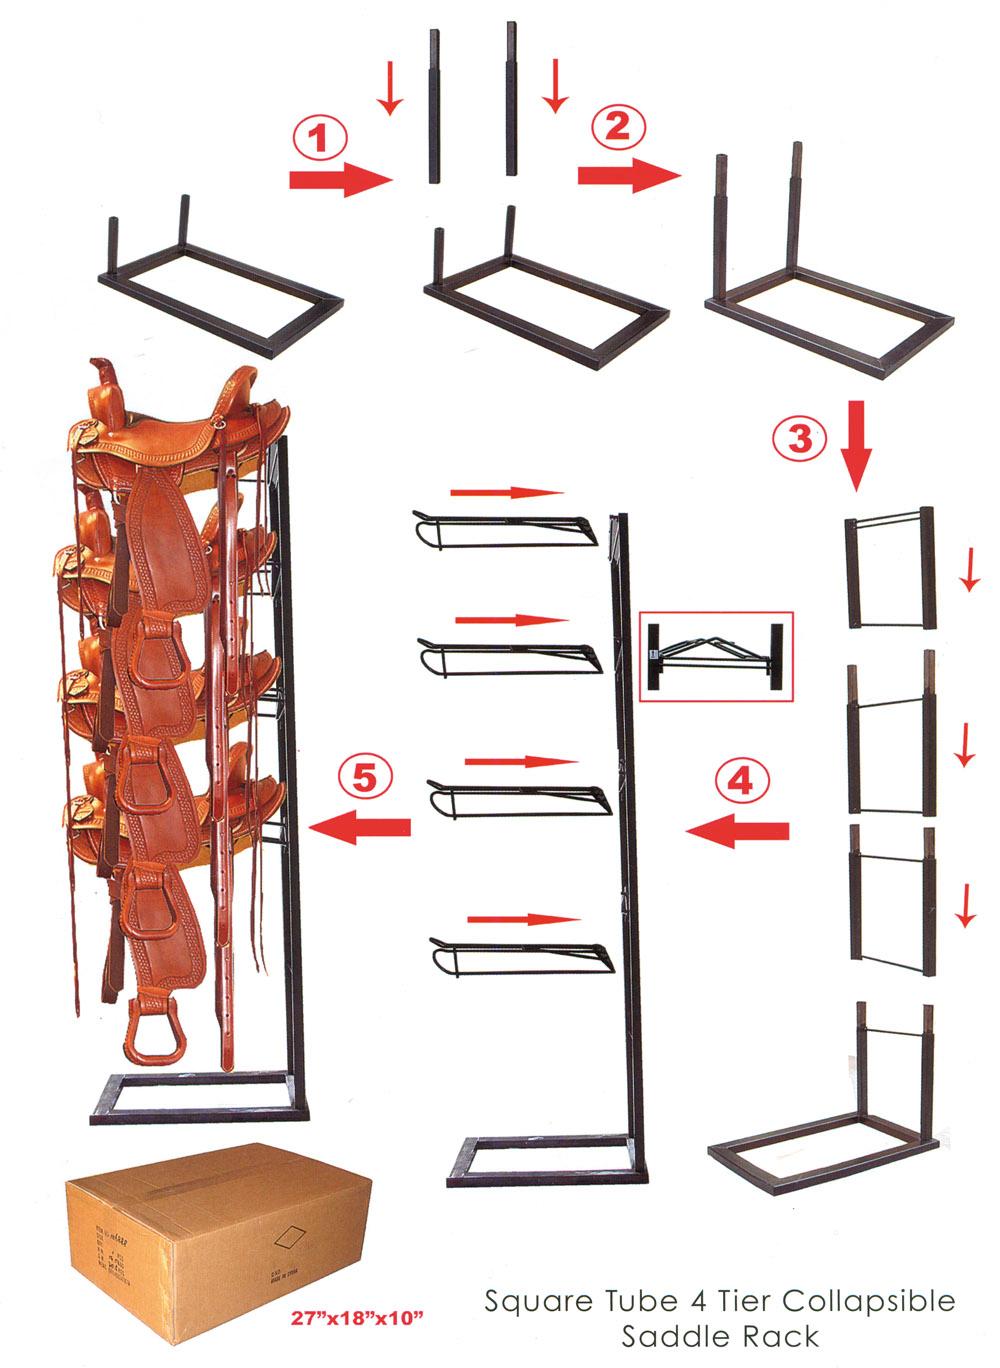 Demonterbar Sadelhållare